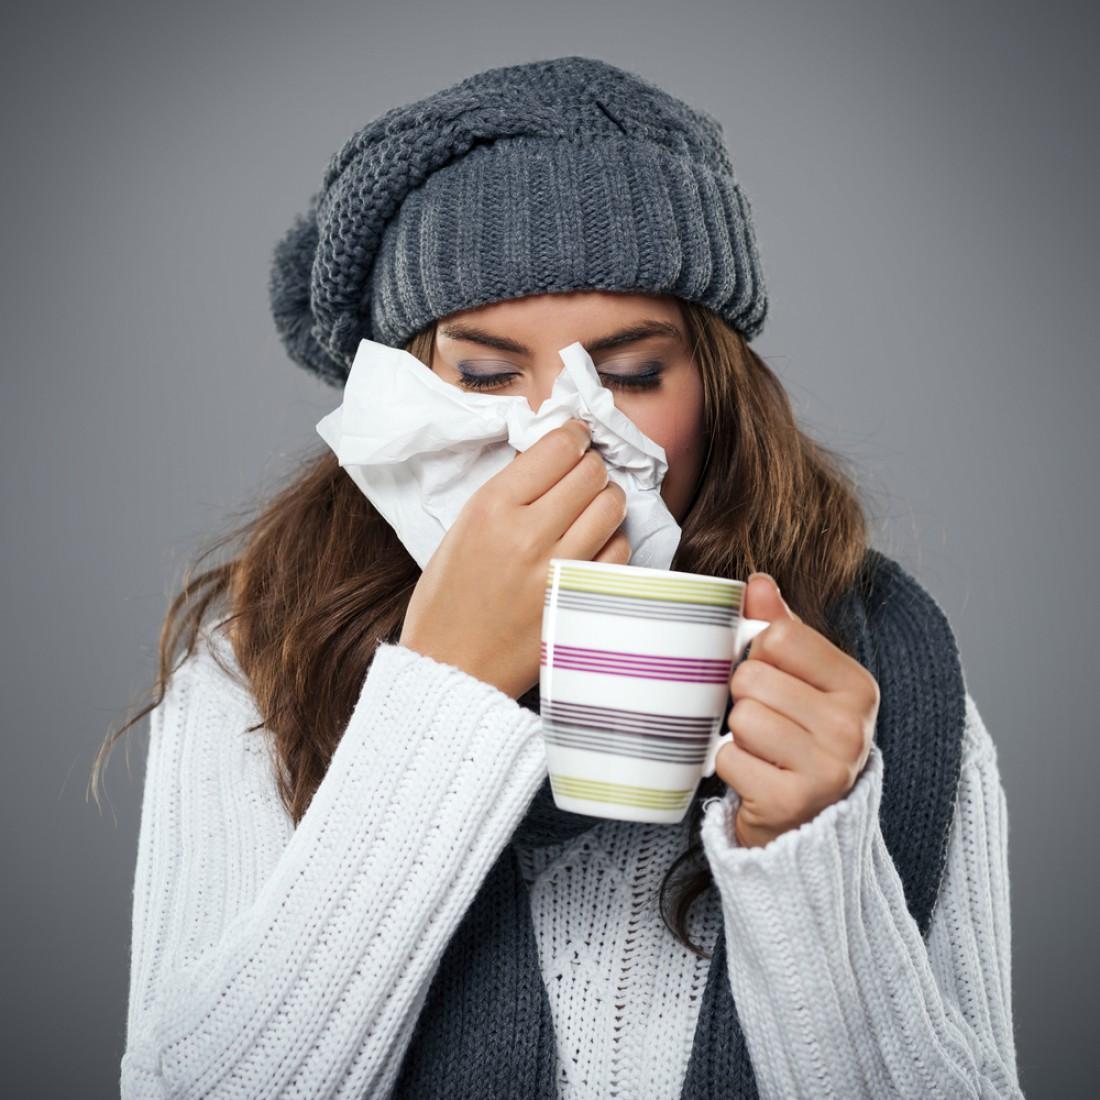 ВМинздраве предупредили: вУкраине будут распространяться три штамма гриппа